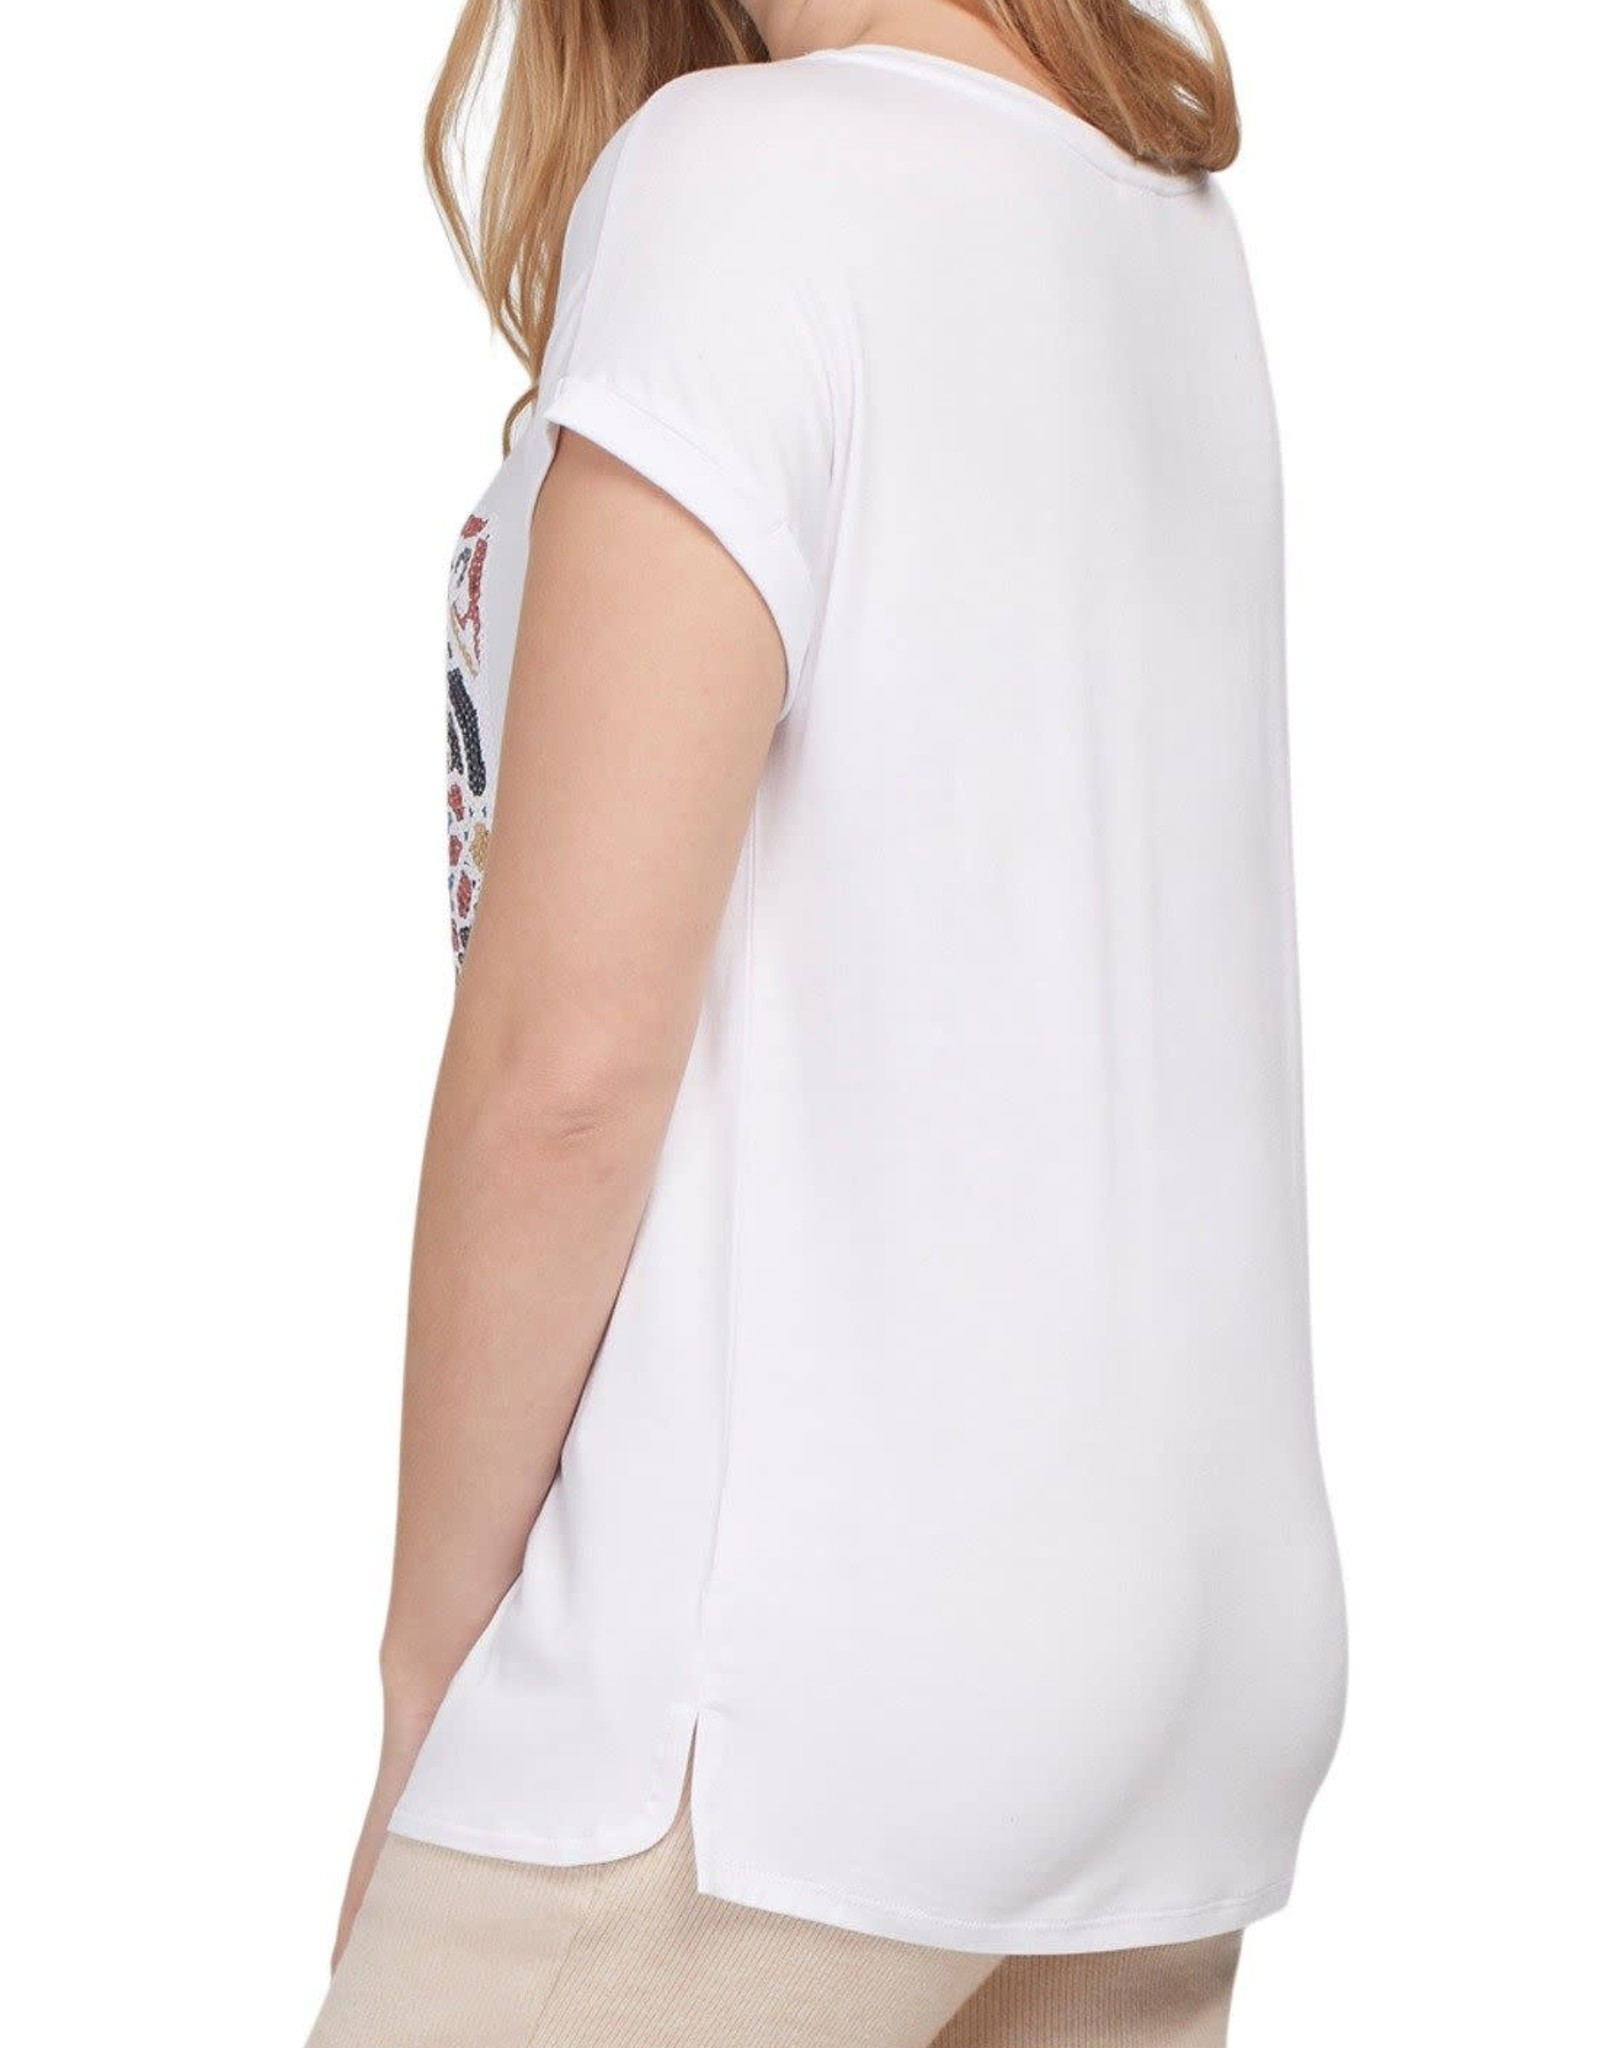 Tribal White Short Sleeve Top w/Sequin Applique